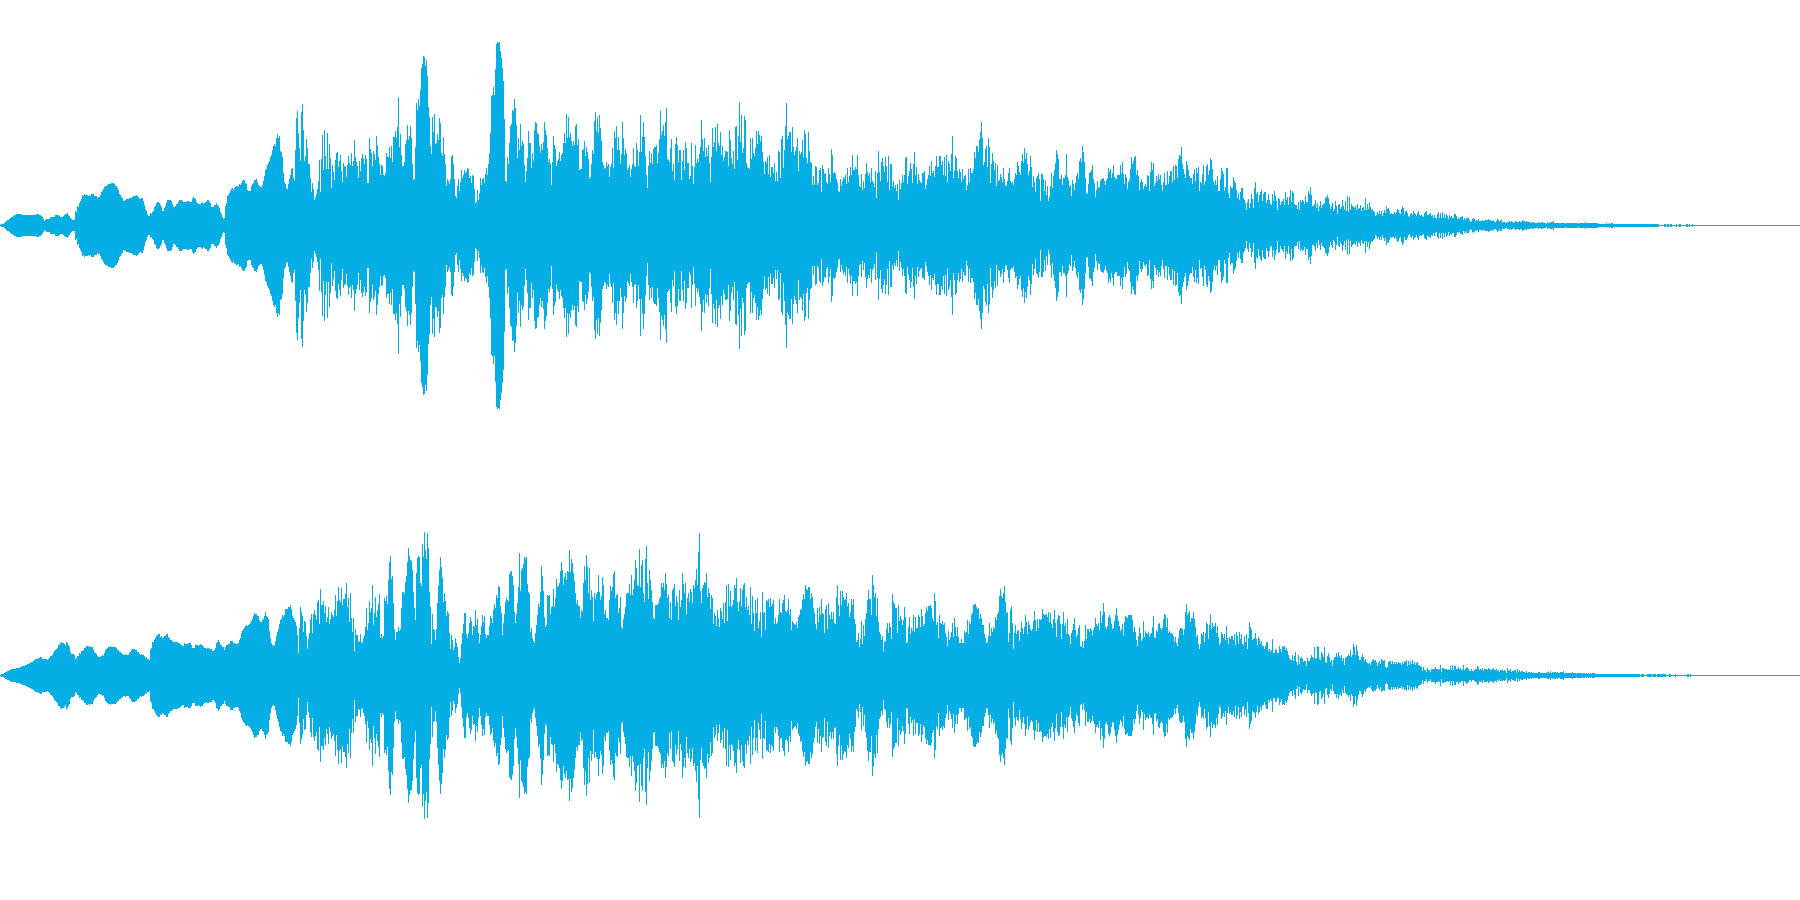 OBAKE 心霊 怪談 肝試し用SE 2の再生済みの波形